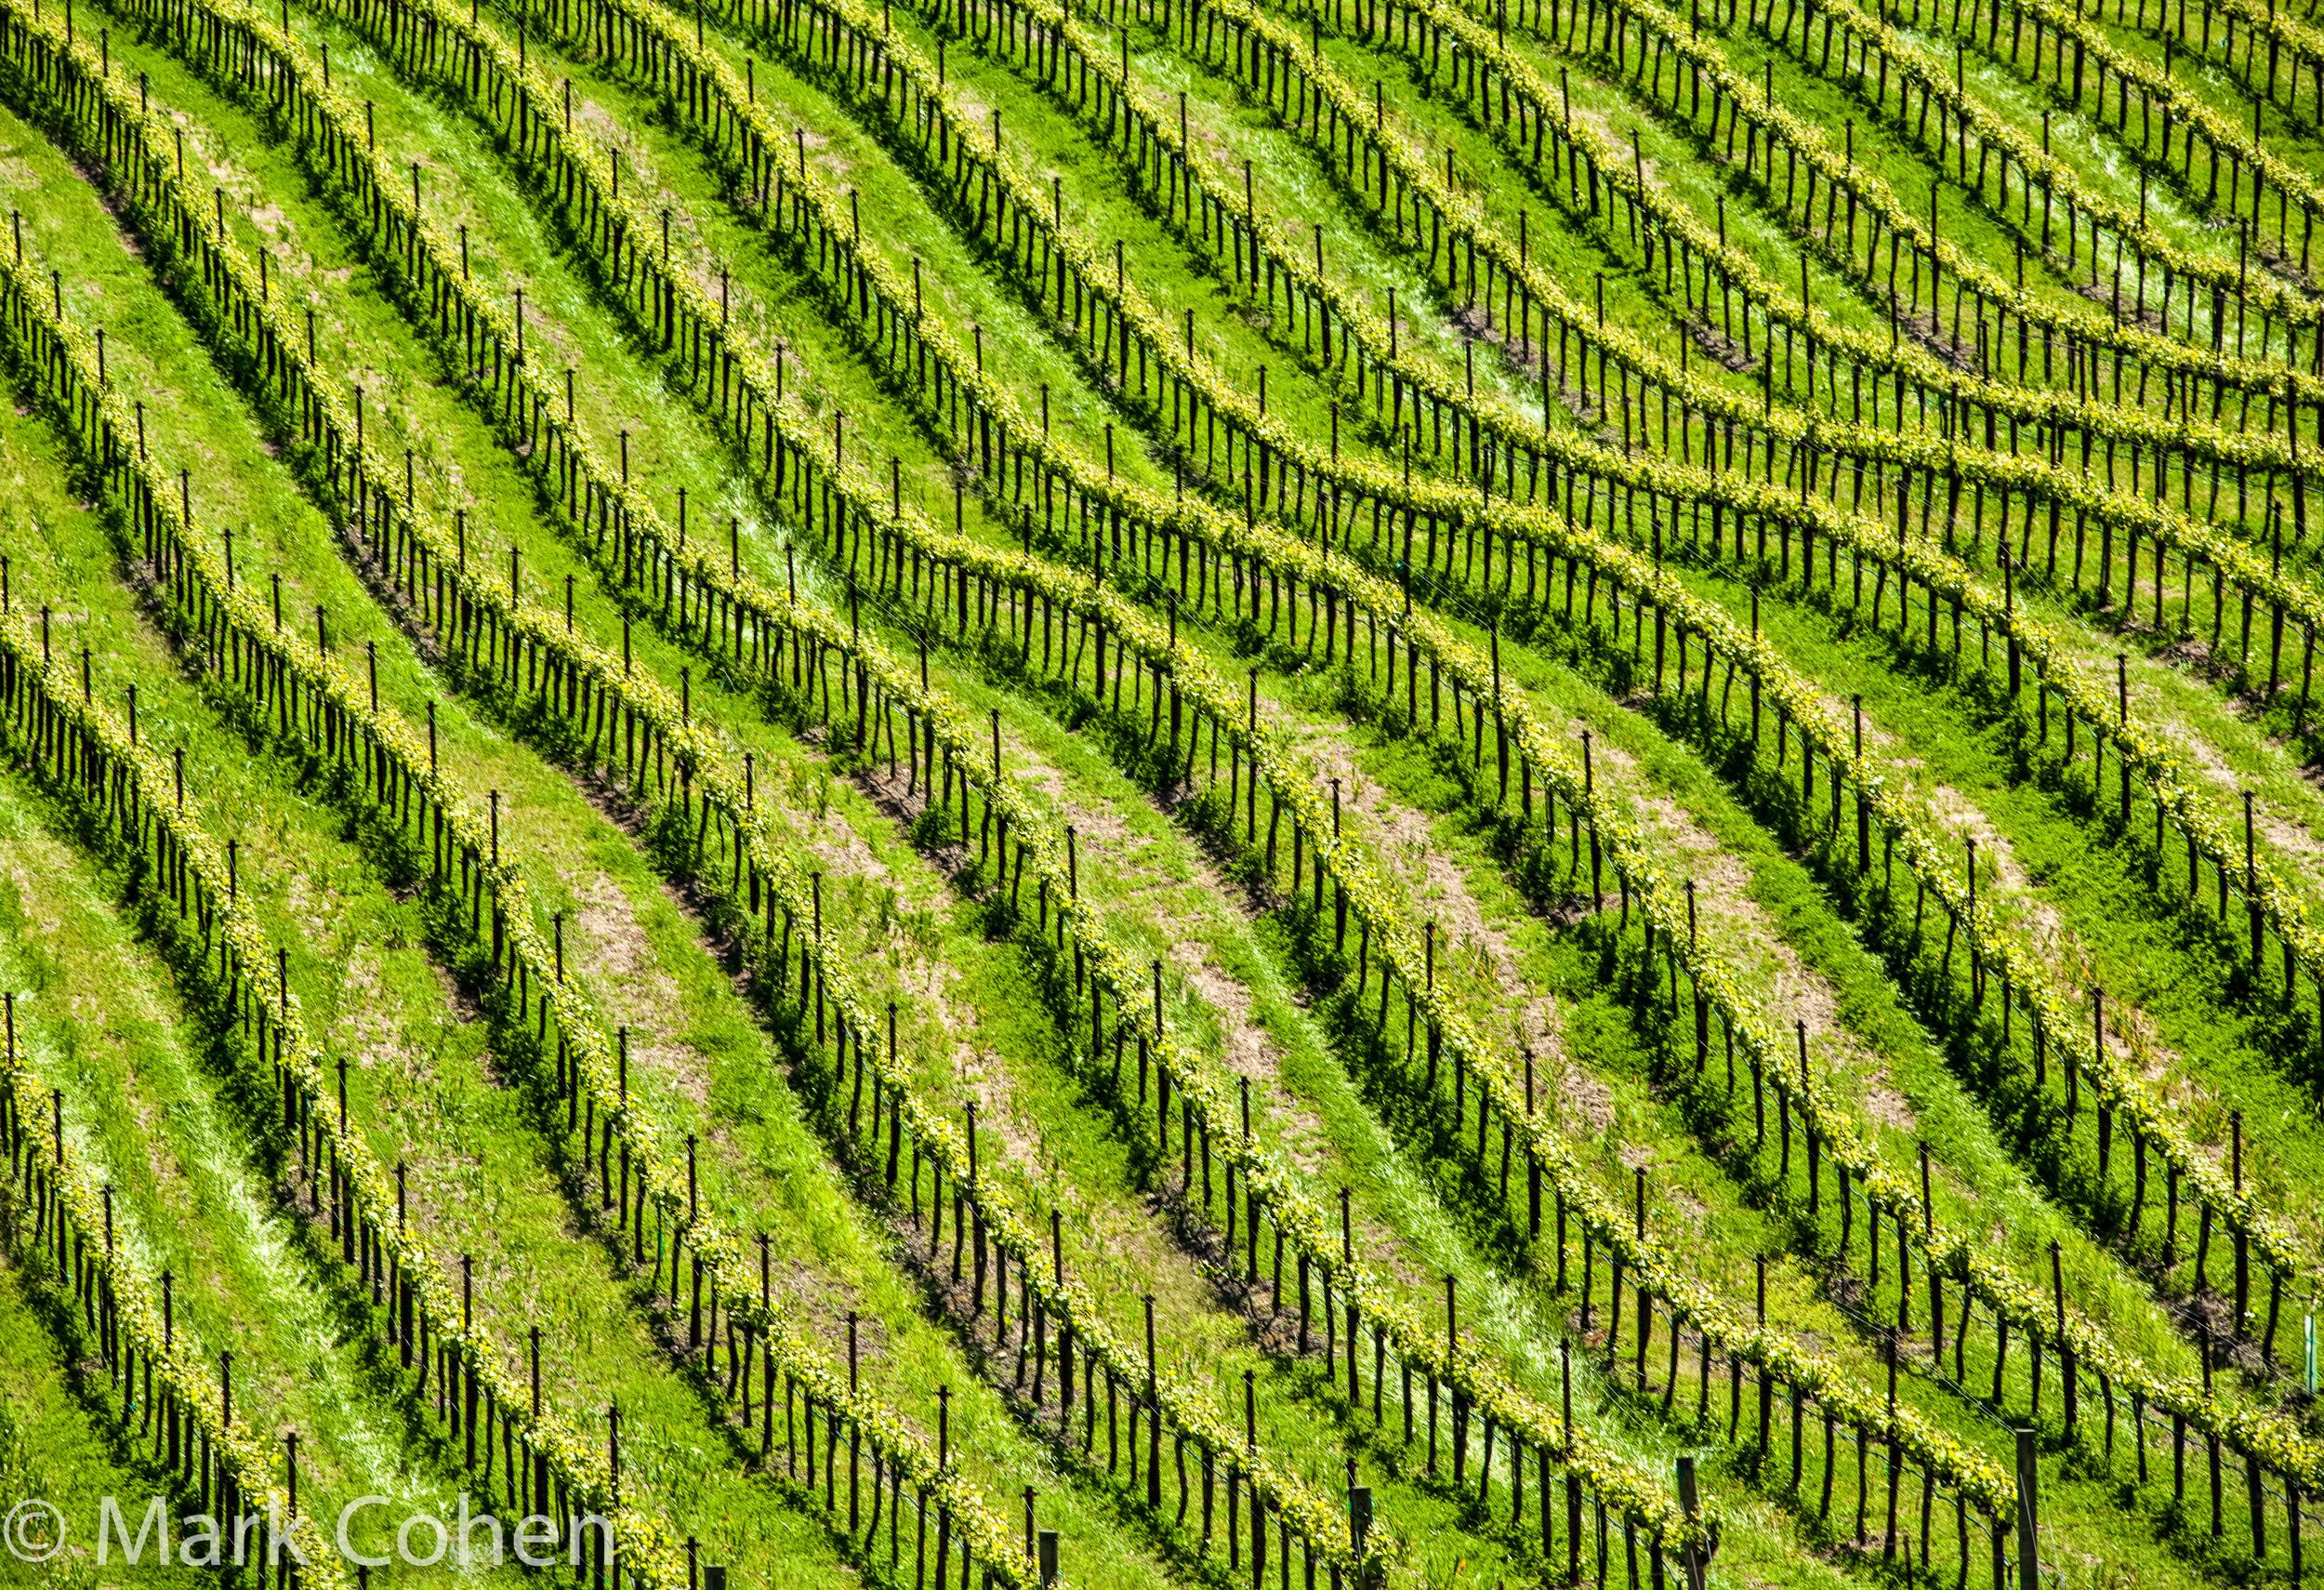 Vineyard no.1, Sonoma County, 2010